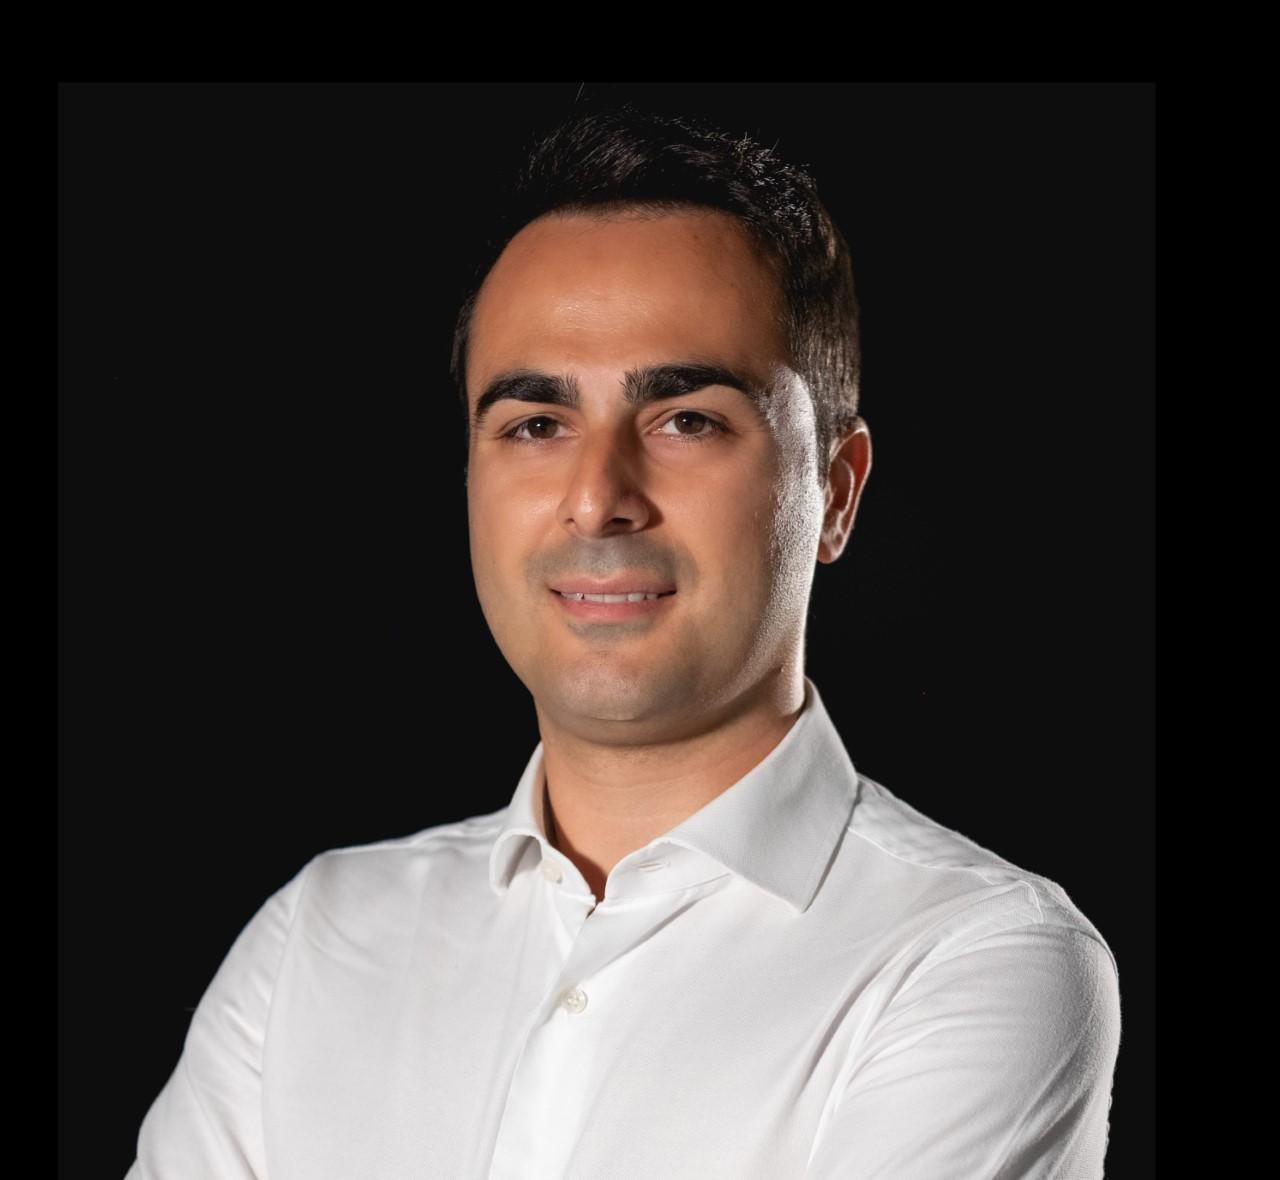 Marco Perrone, director, head of Open Innovation & Acceleration Deloitte